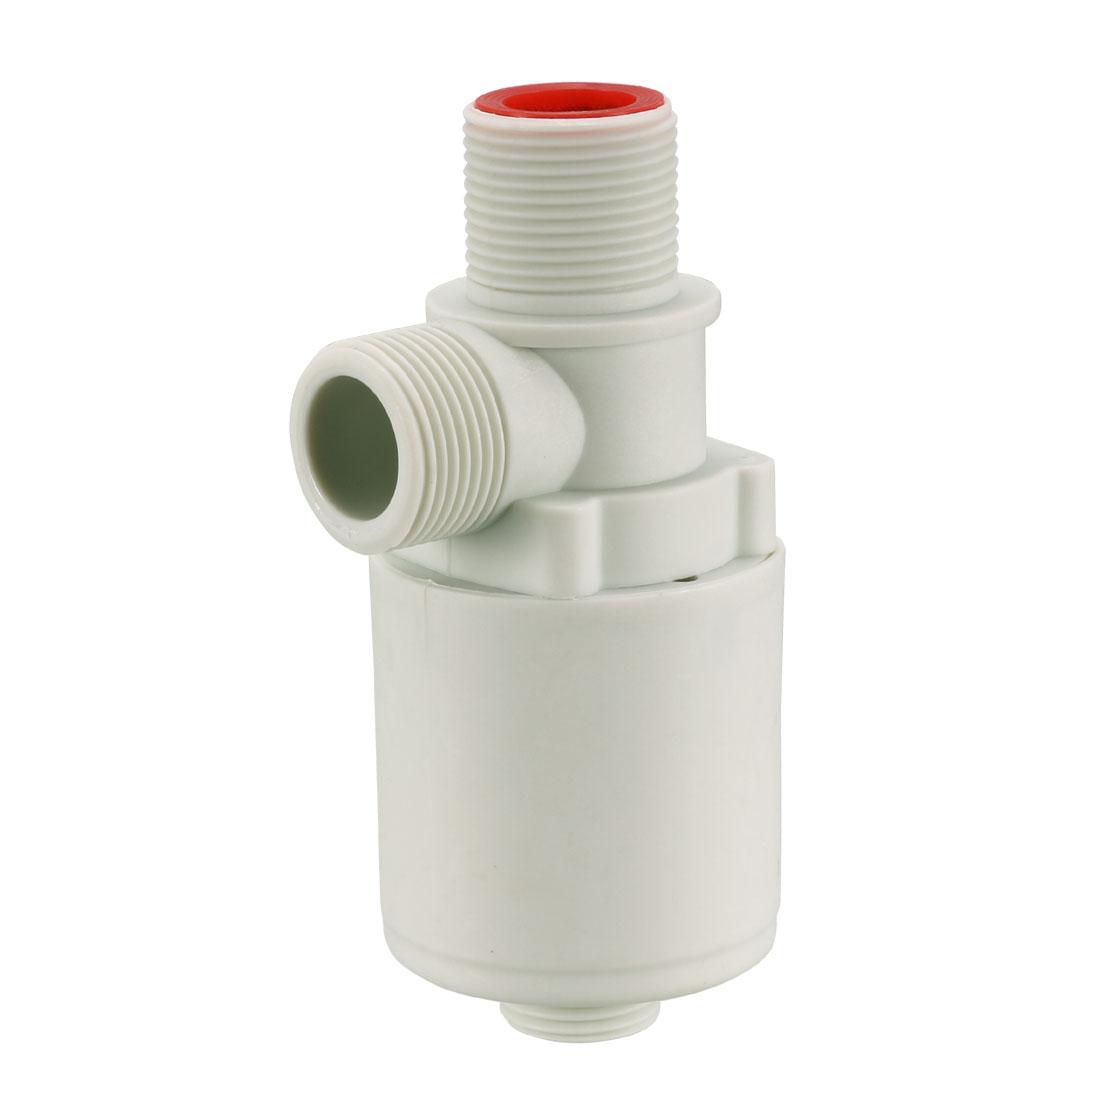 Float Ball Valve G3/4 Thread Plastic Vertical Exterior Water Level Sensor